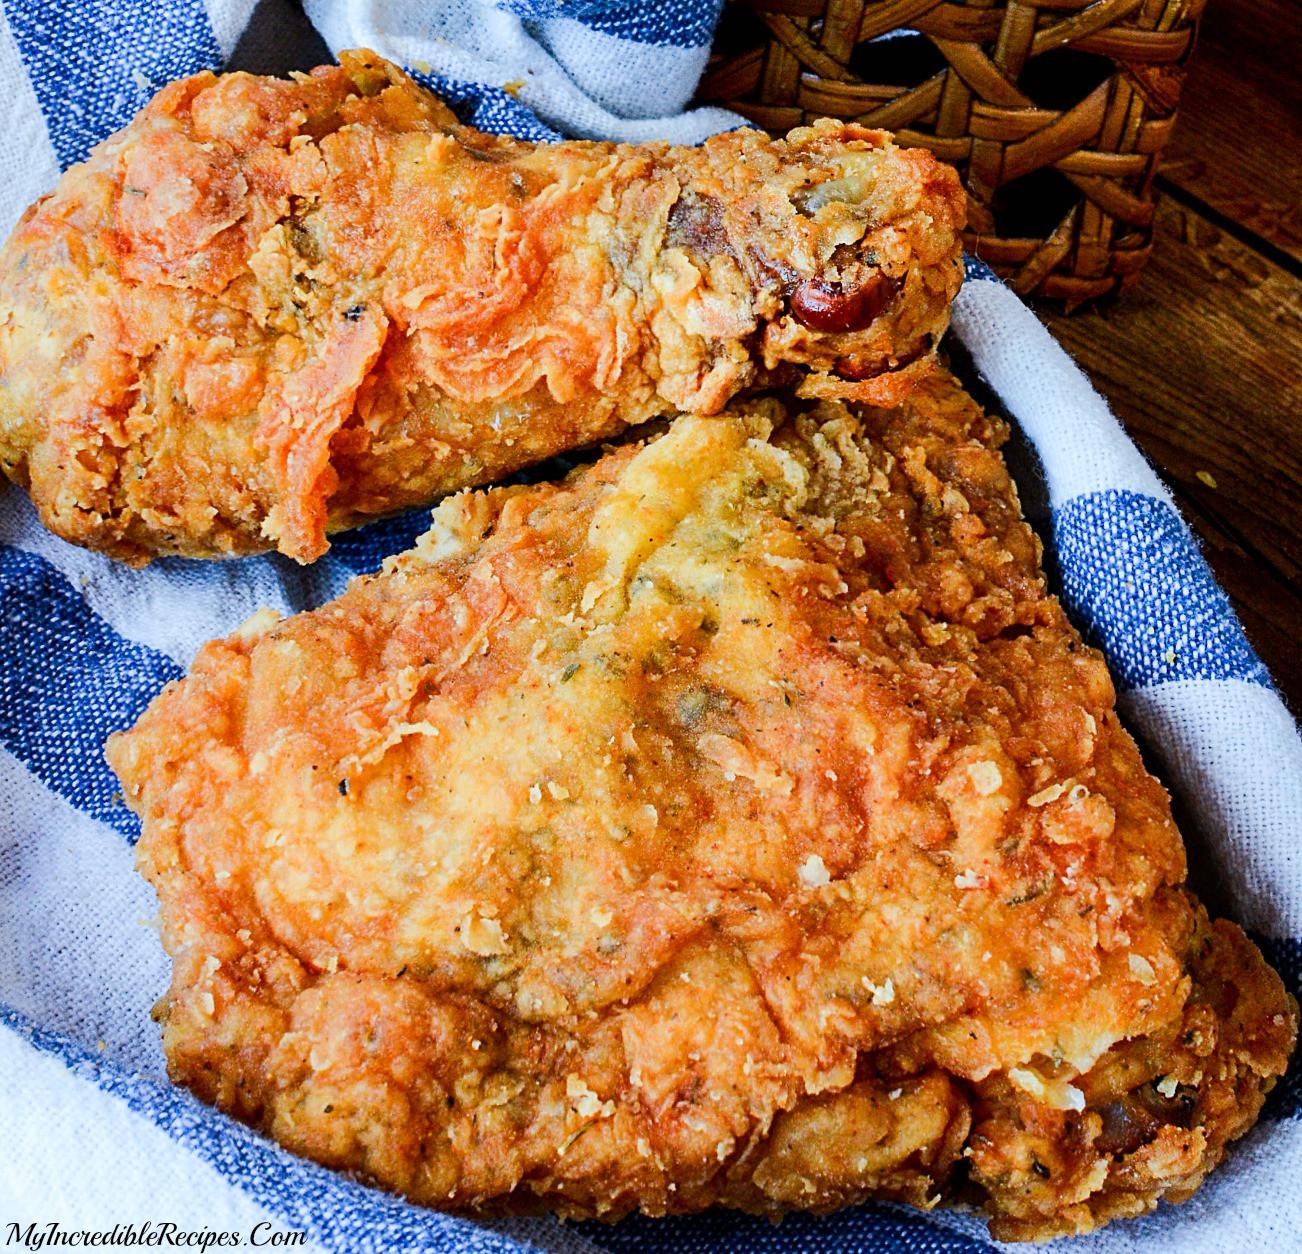 Fried Chicken Recipes  Southern KFC SECRET Fried Chicken Recipe